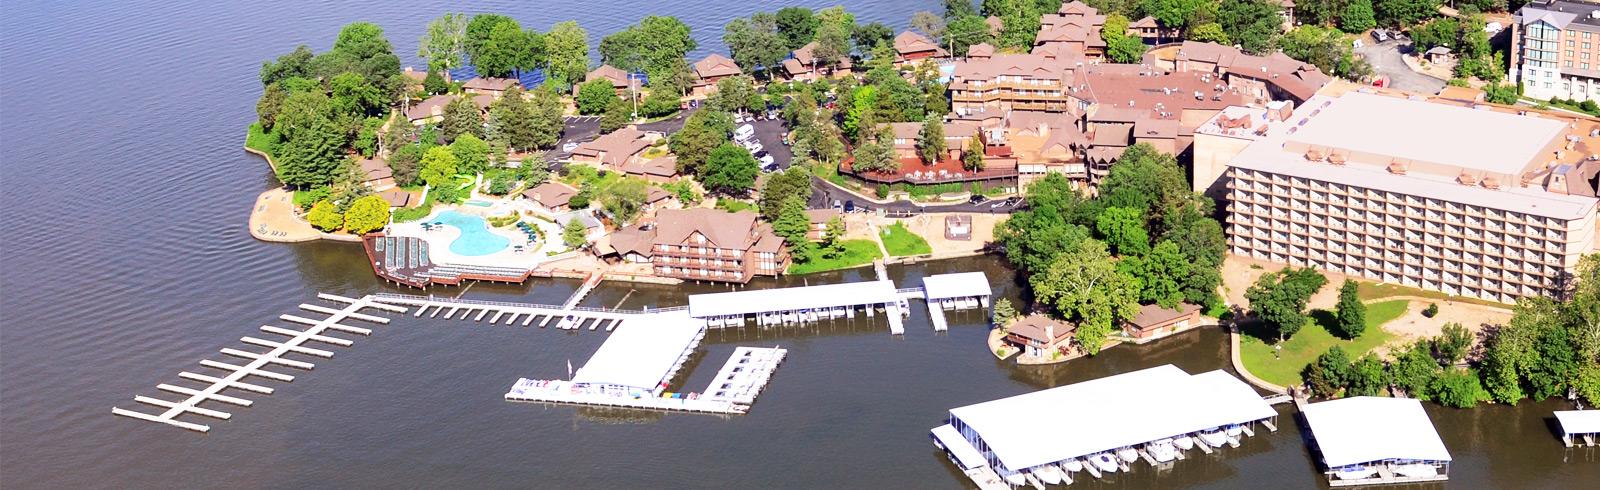 Tan-Tar-A Estates & Conference Center at Osage Beach, Missouri